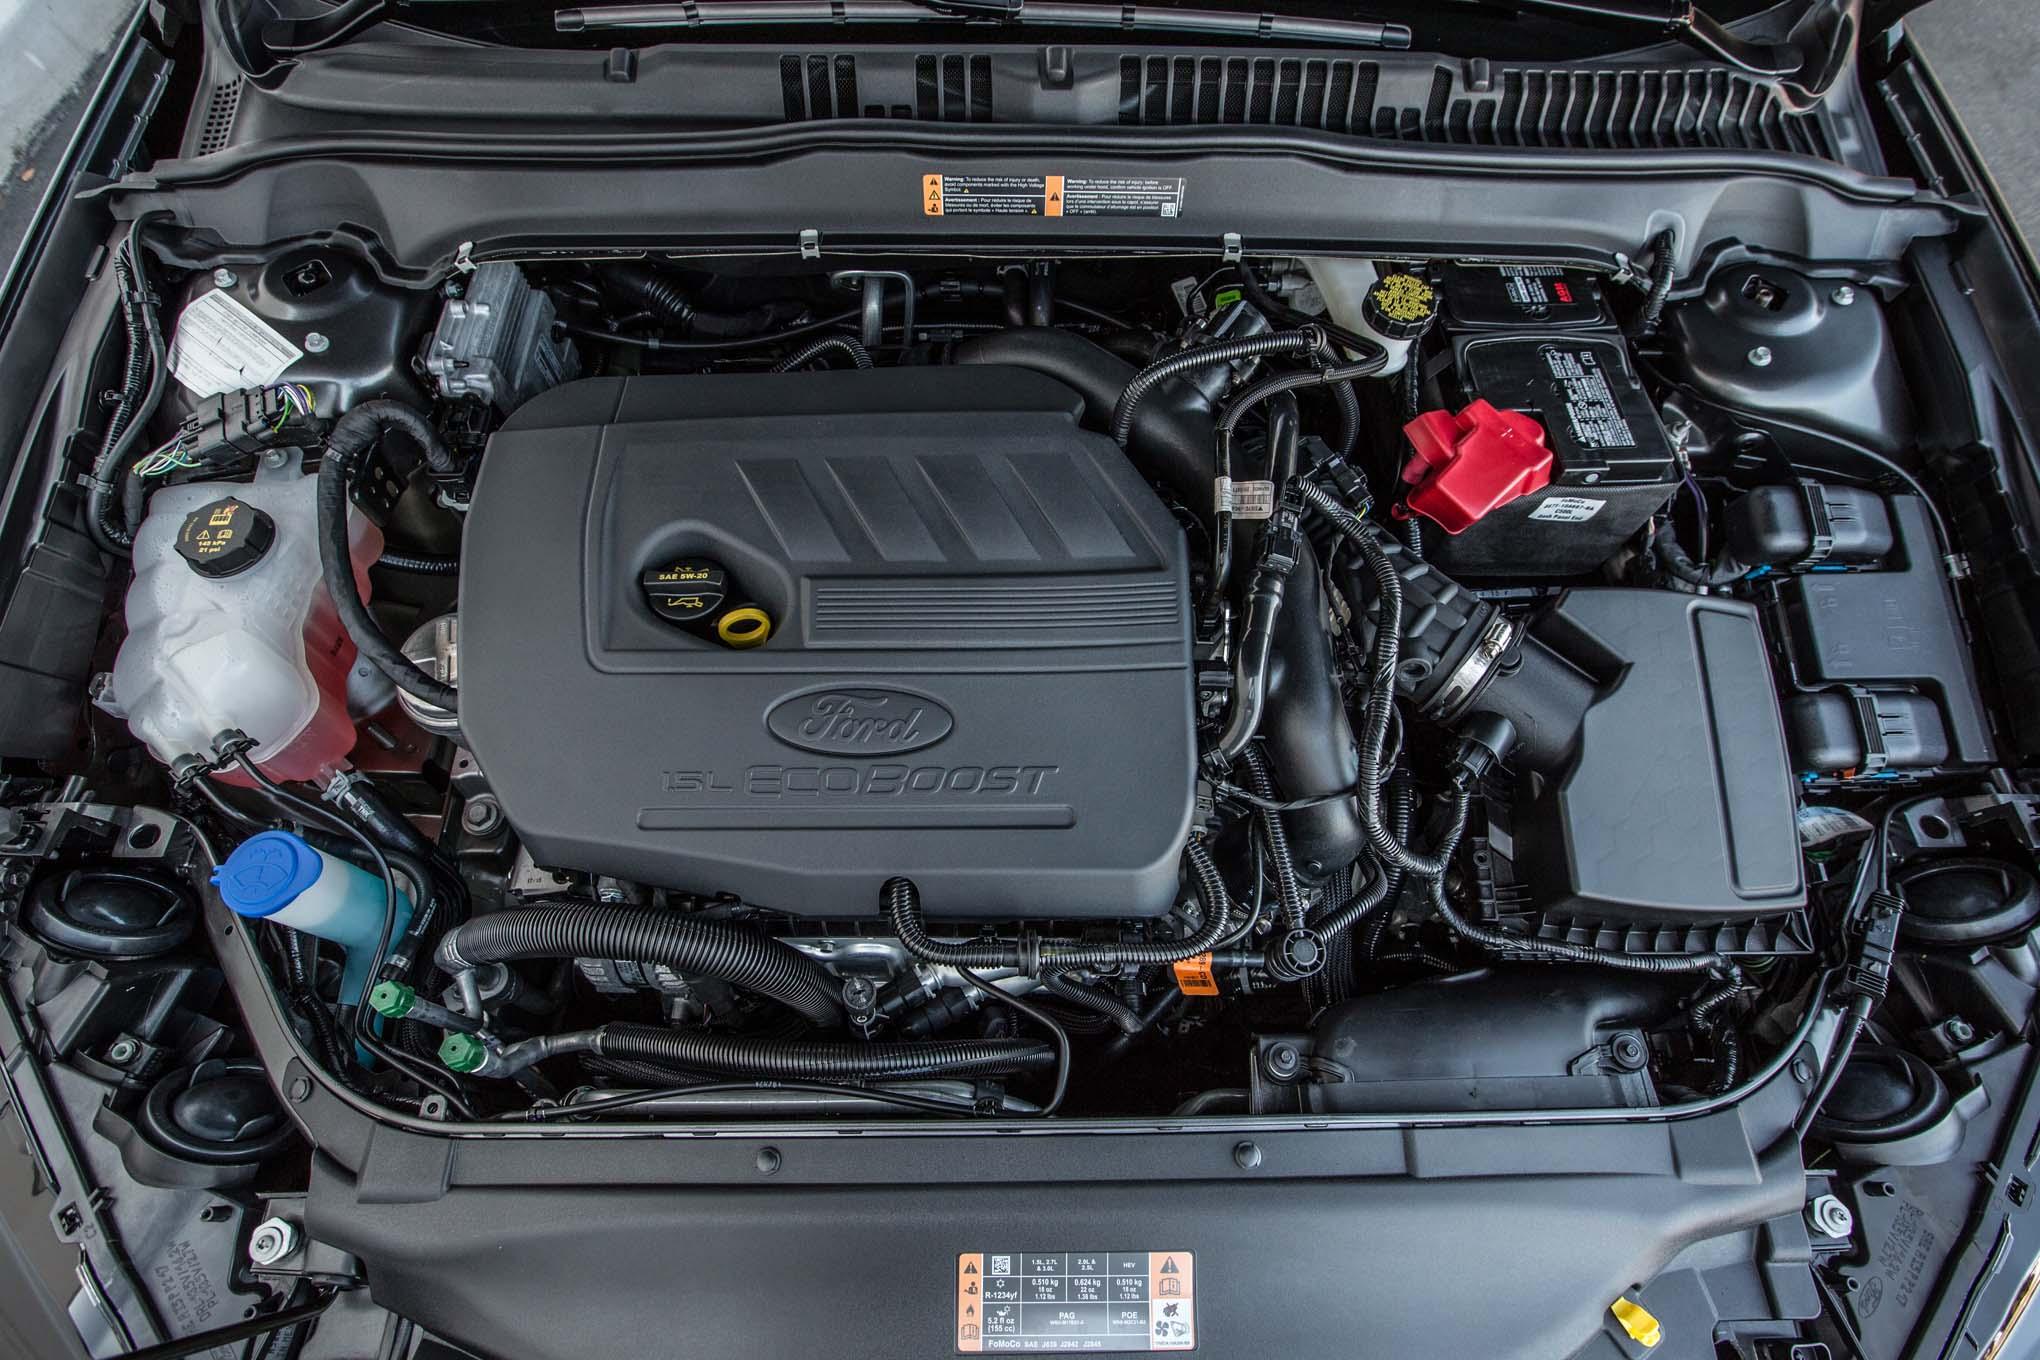 2017 Ford Fusion 15L Ecoboost | EcoboostForum